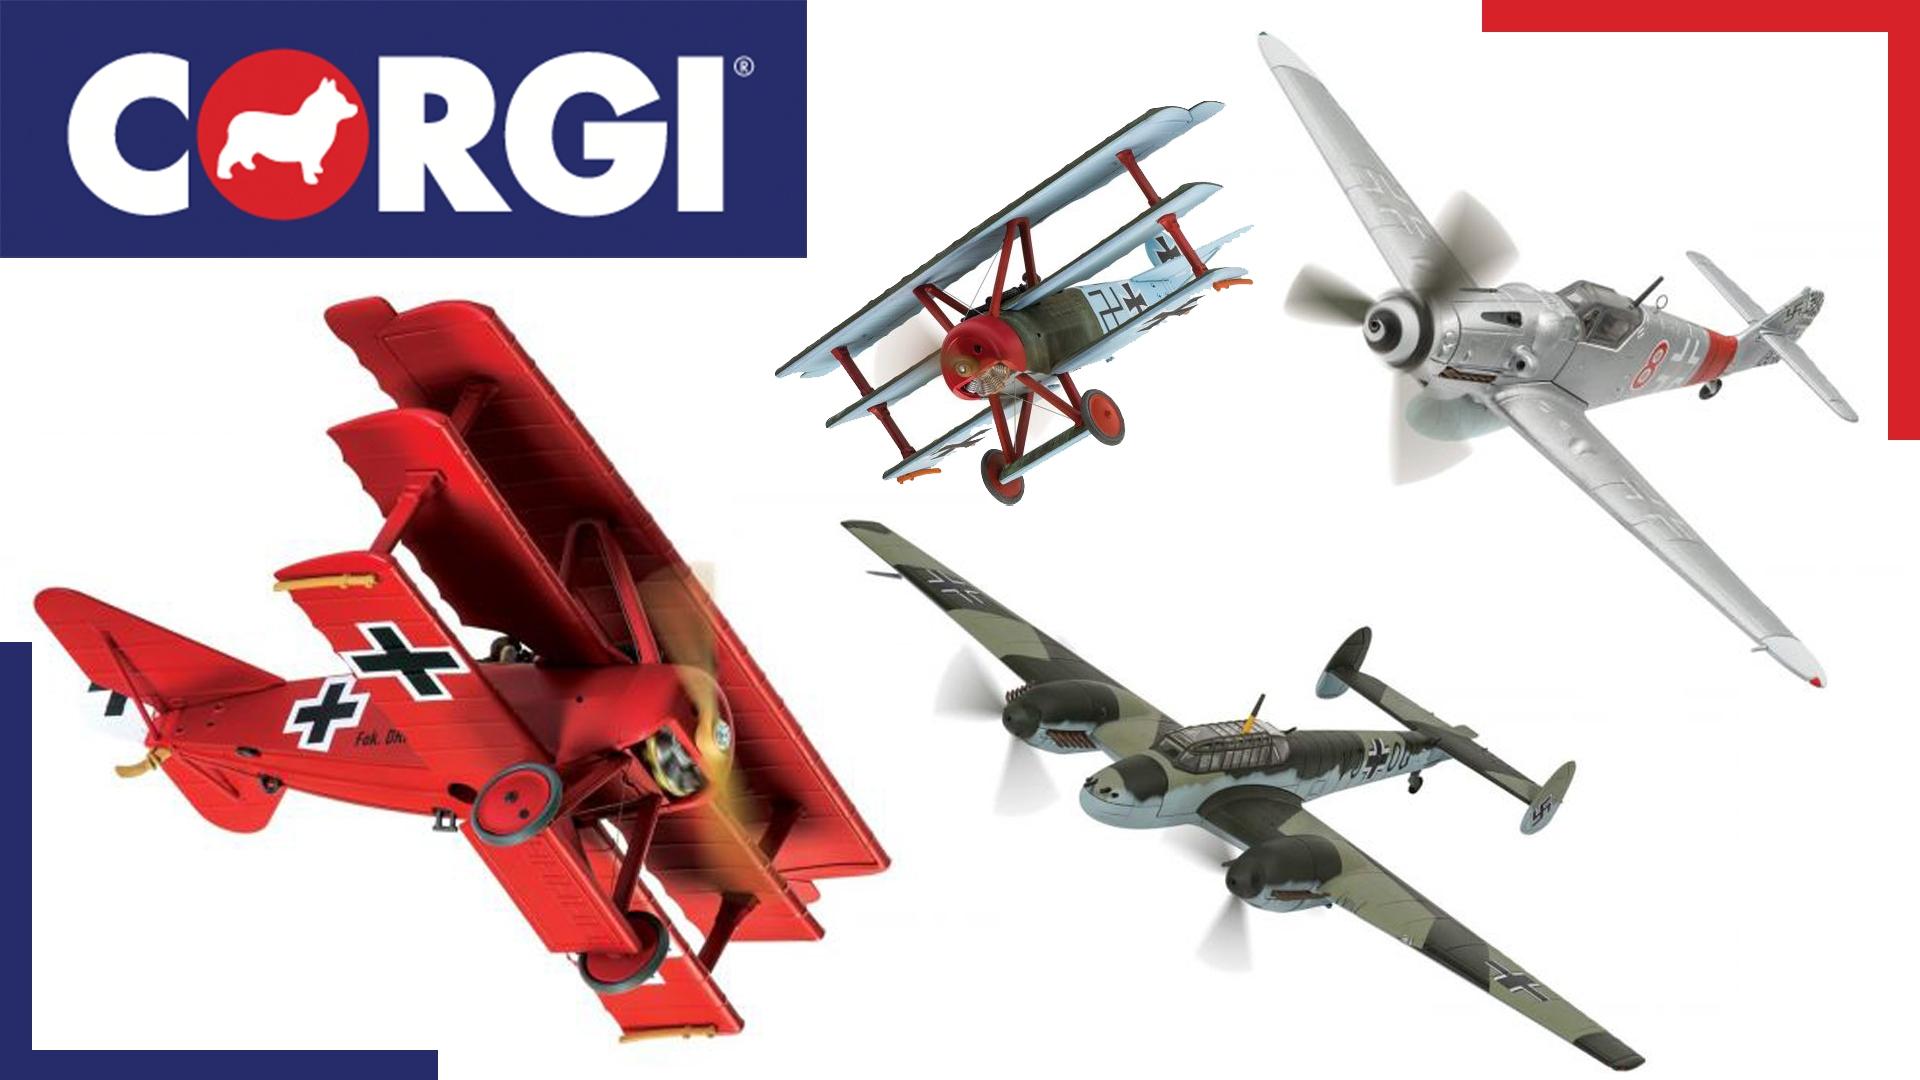 Corgi Aviation Archive